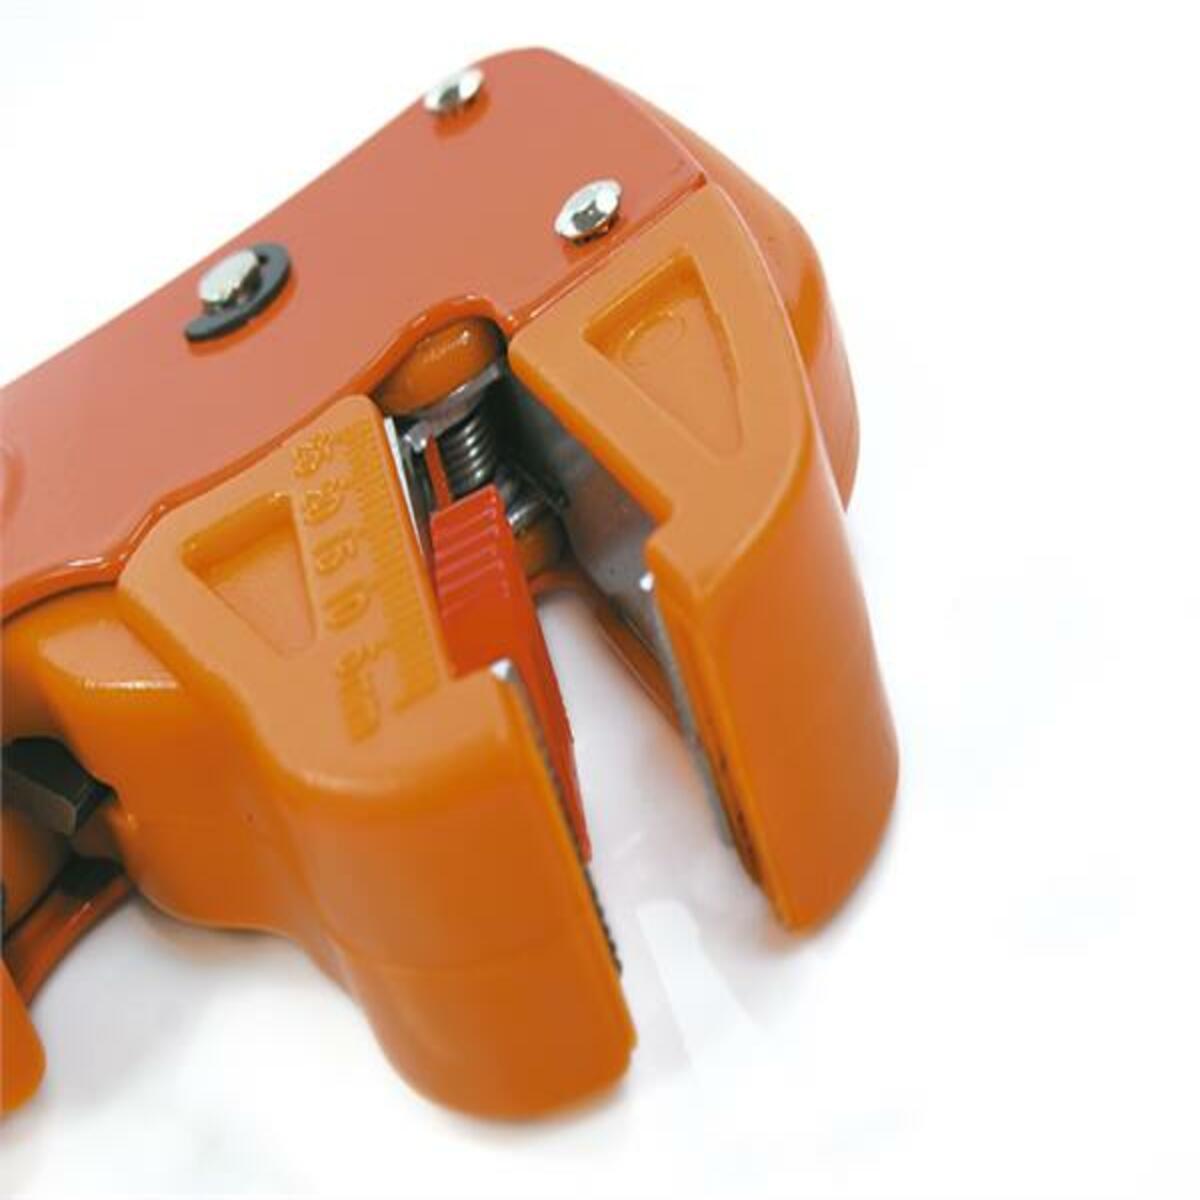 Alicate decapador HK-310 Hikari  - EMPORIO K